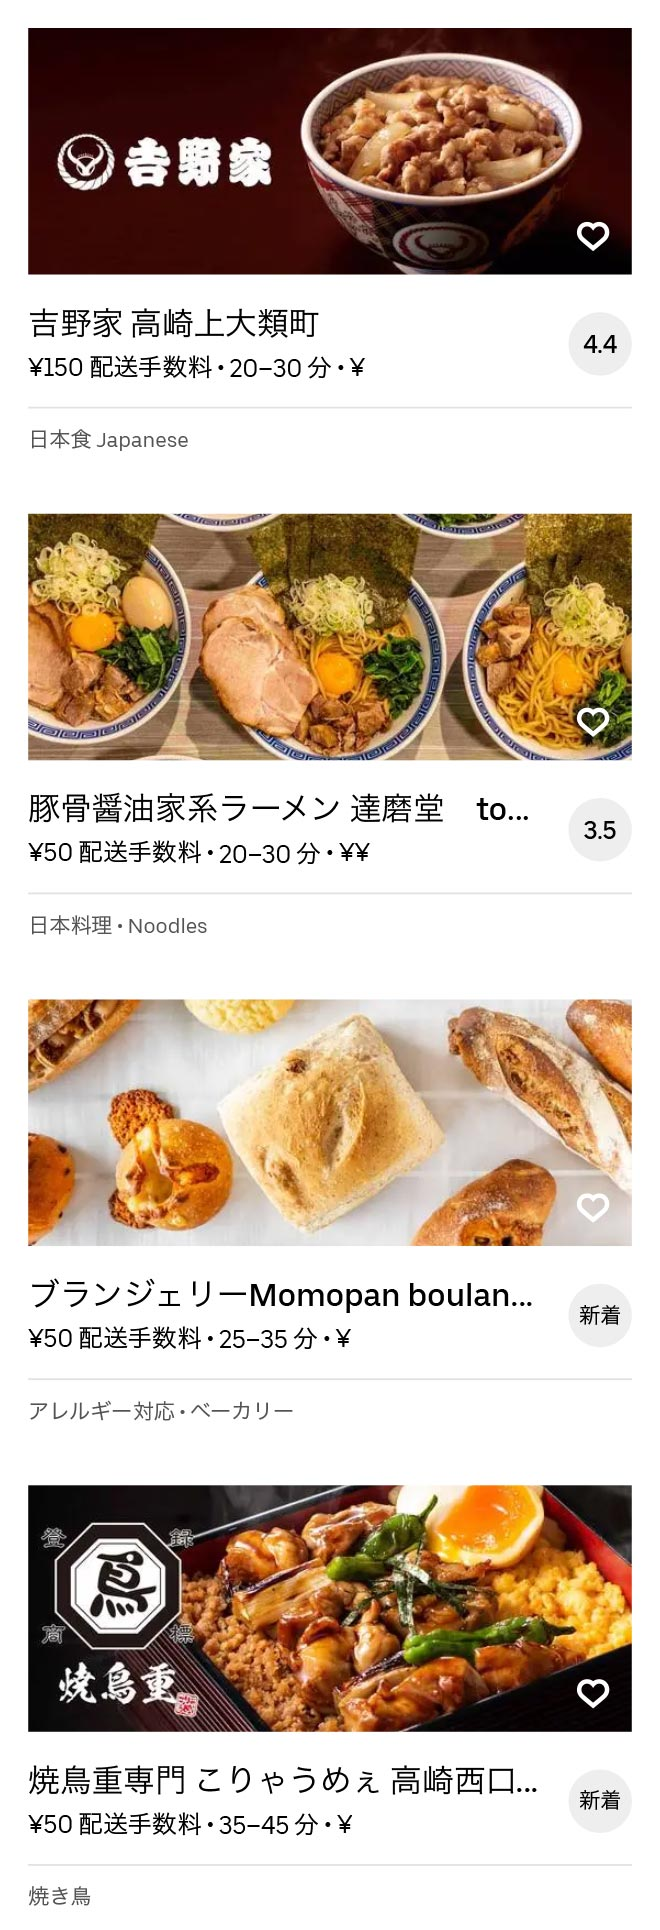 Takasaki menu 2010 06